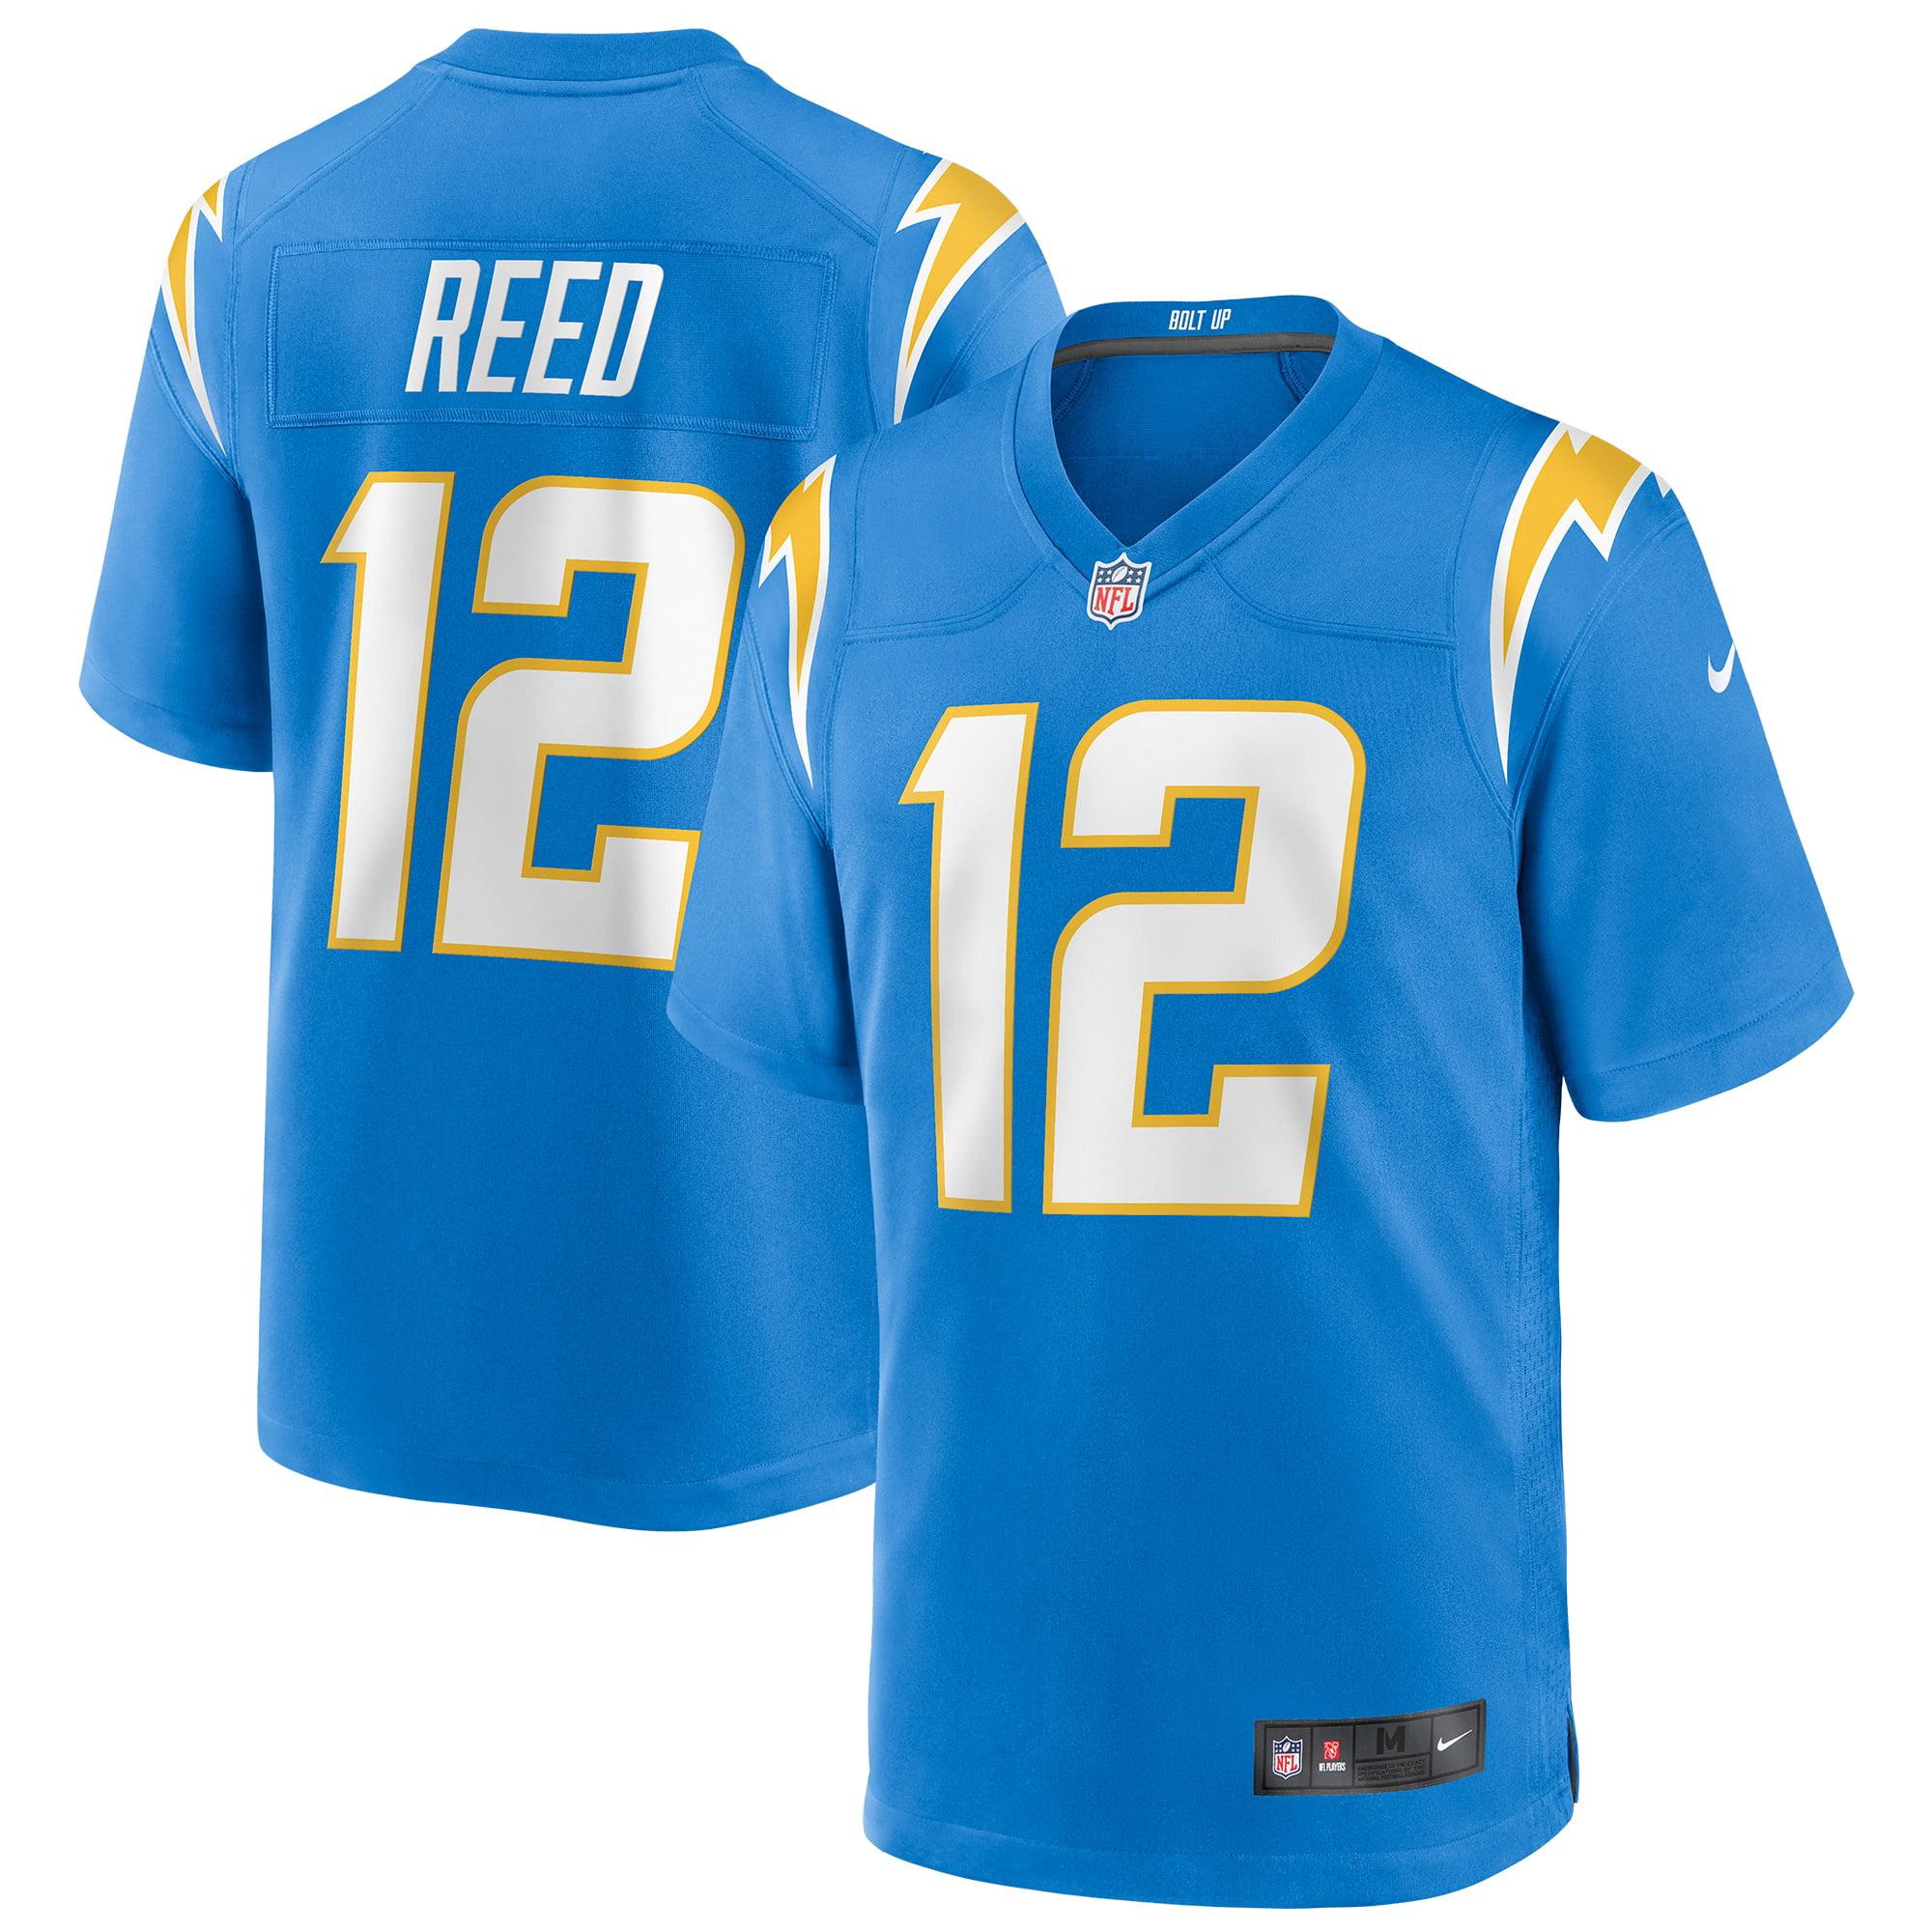 Joe Reed Los Angeles Chargers Nike Player Game Jersey - Powder Blue - Walmart.com